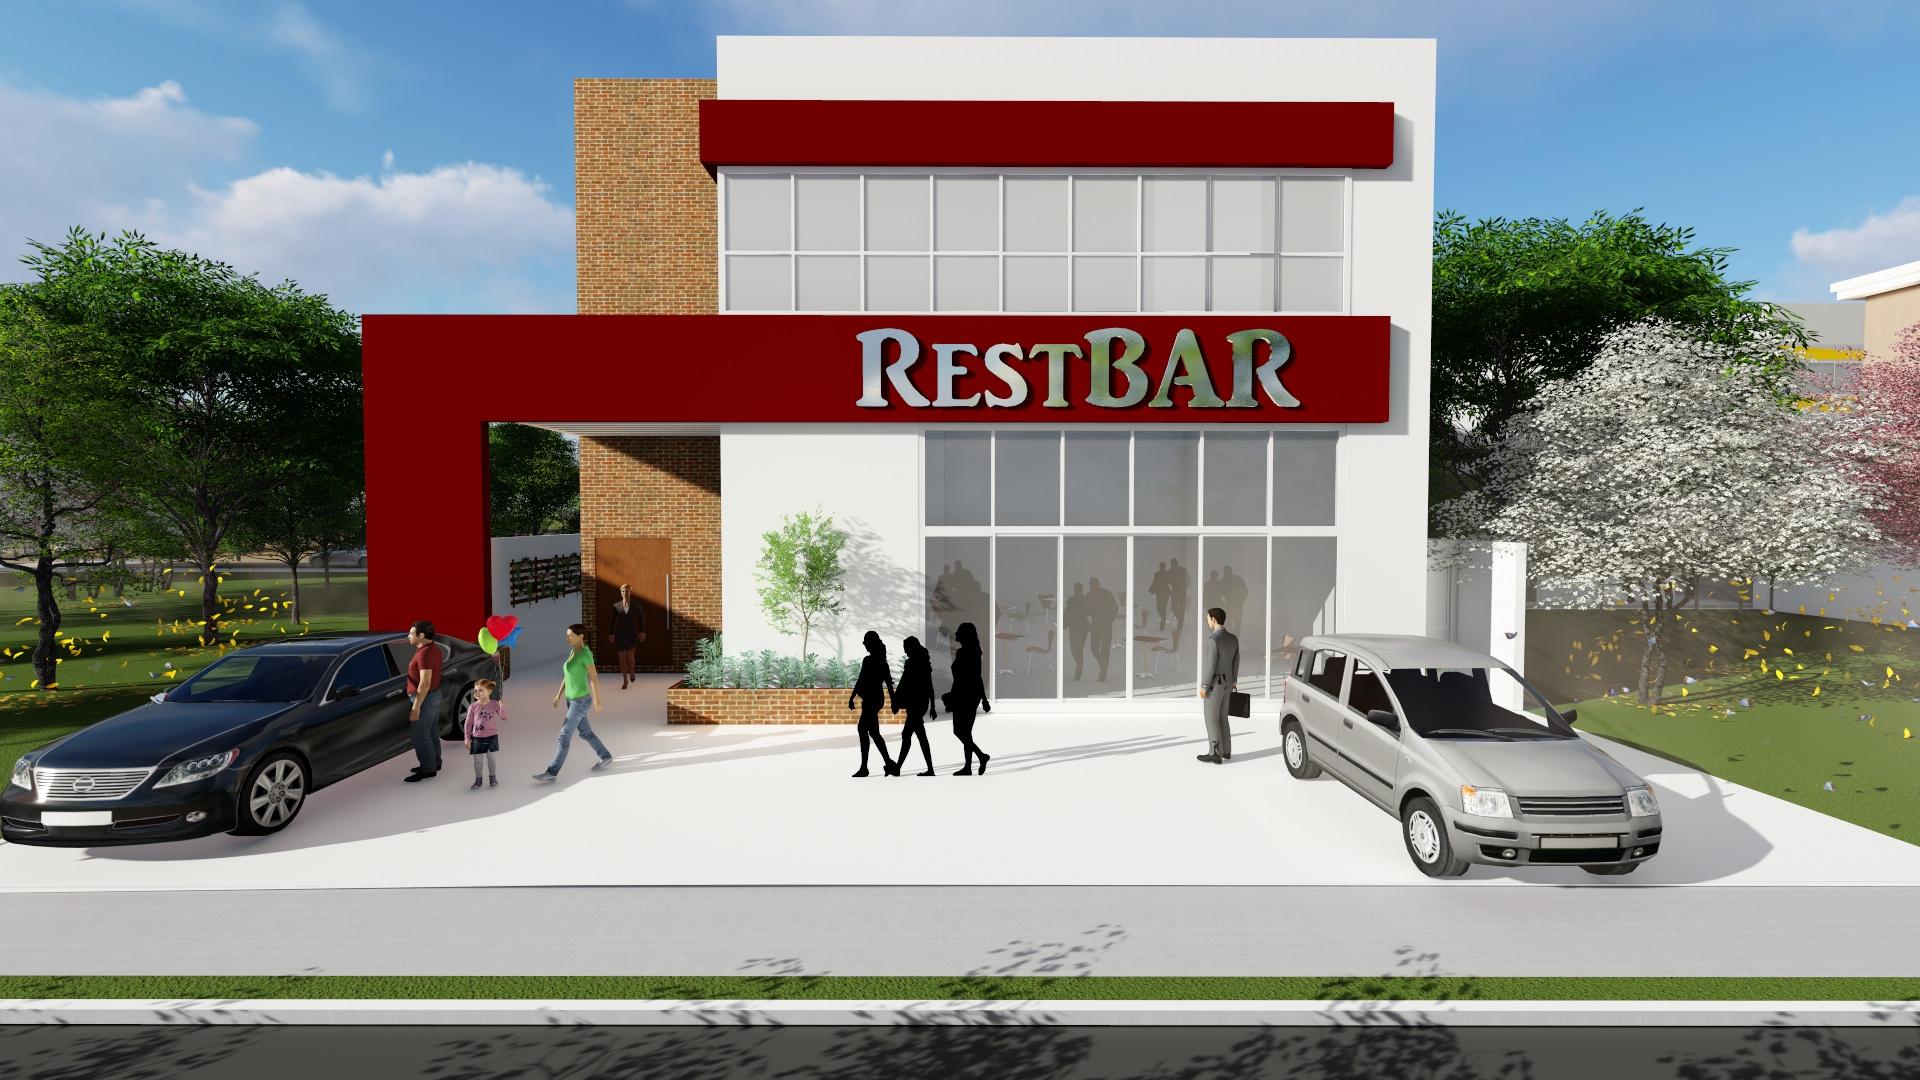 arquitetura-comercial-fachada-restaurante